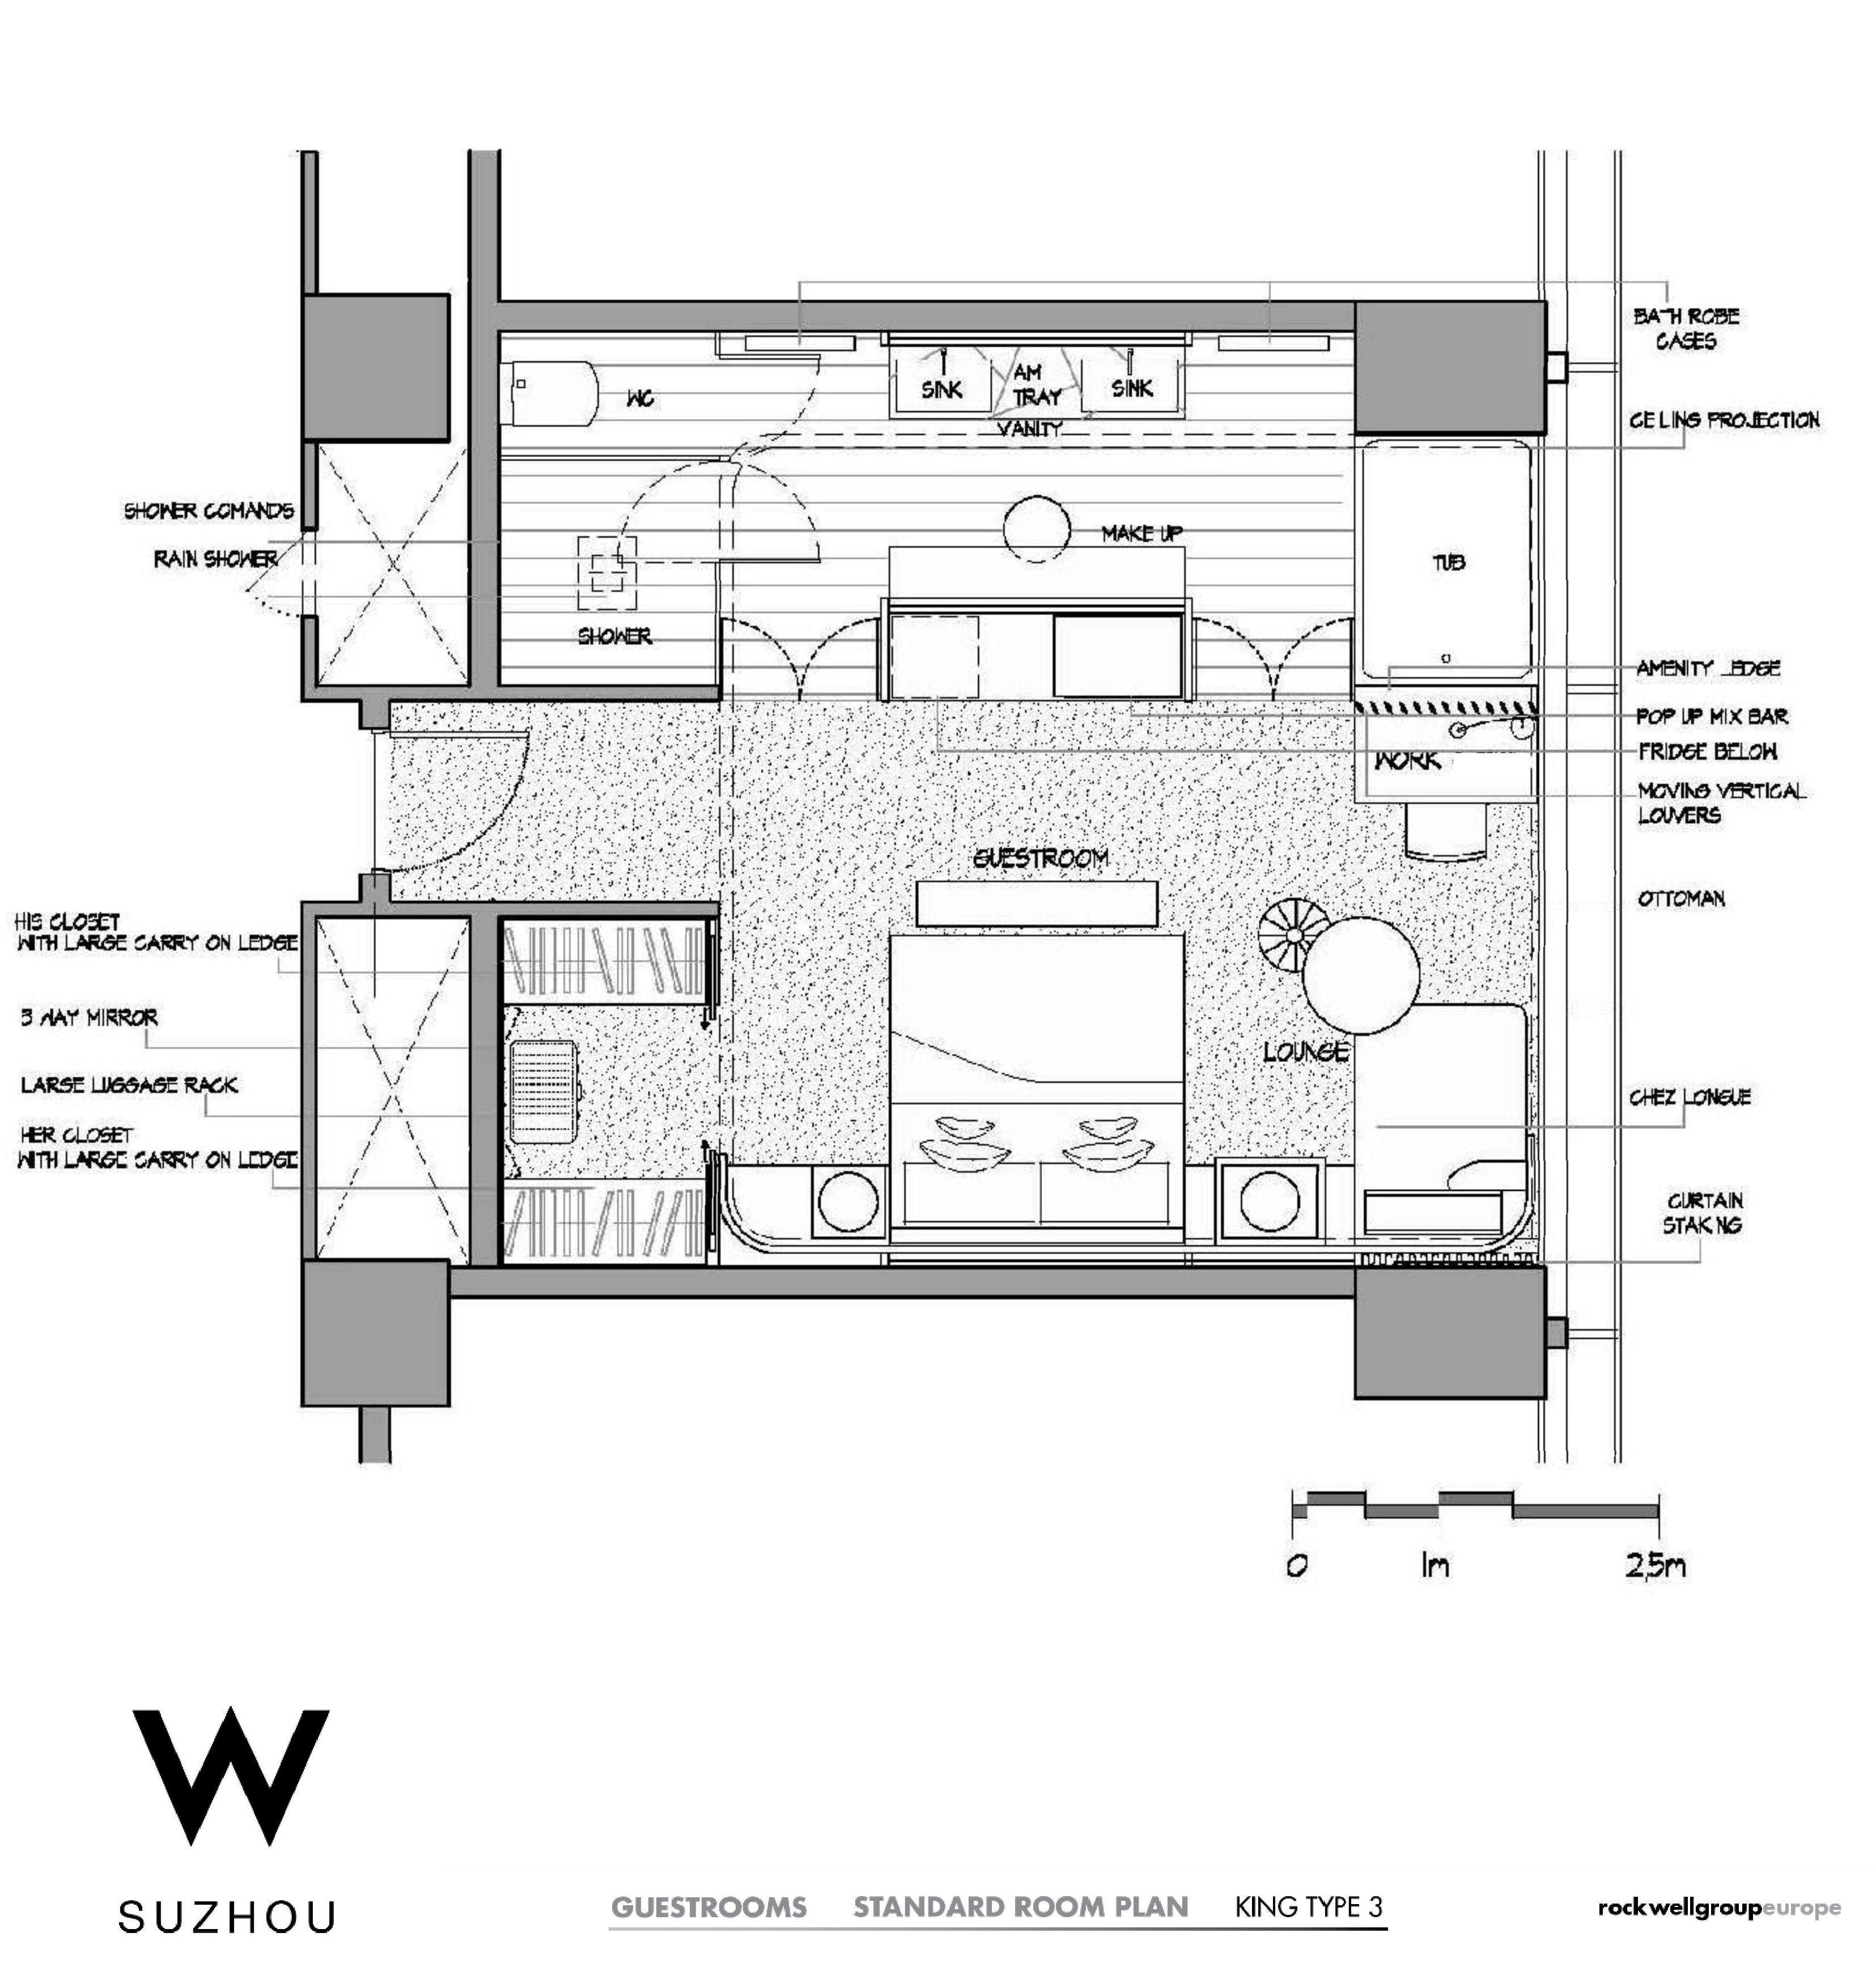 W Suzhou Hotel Floor Plan Architectural Floor Plans Hotel Room Design Plan